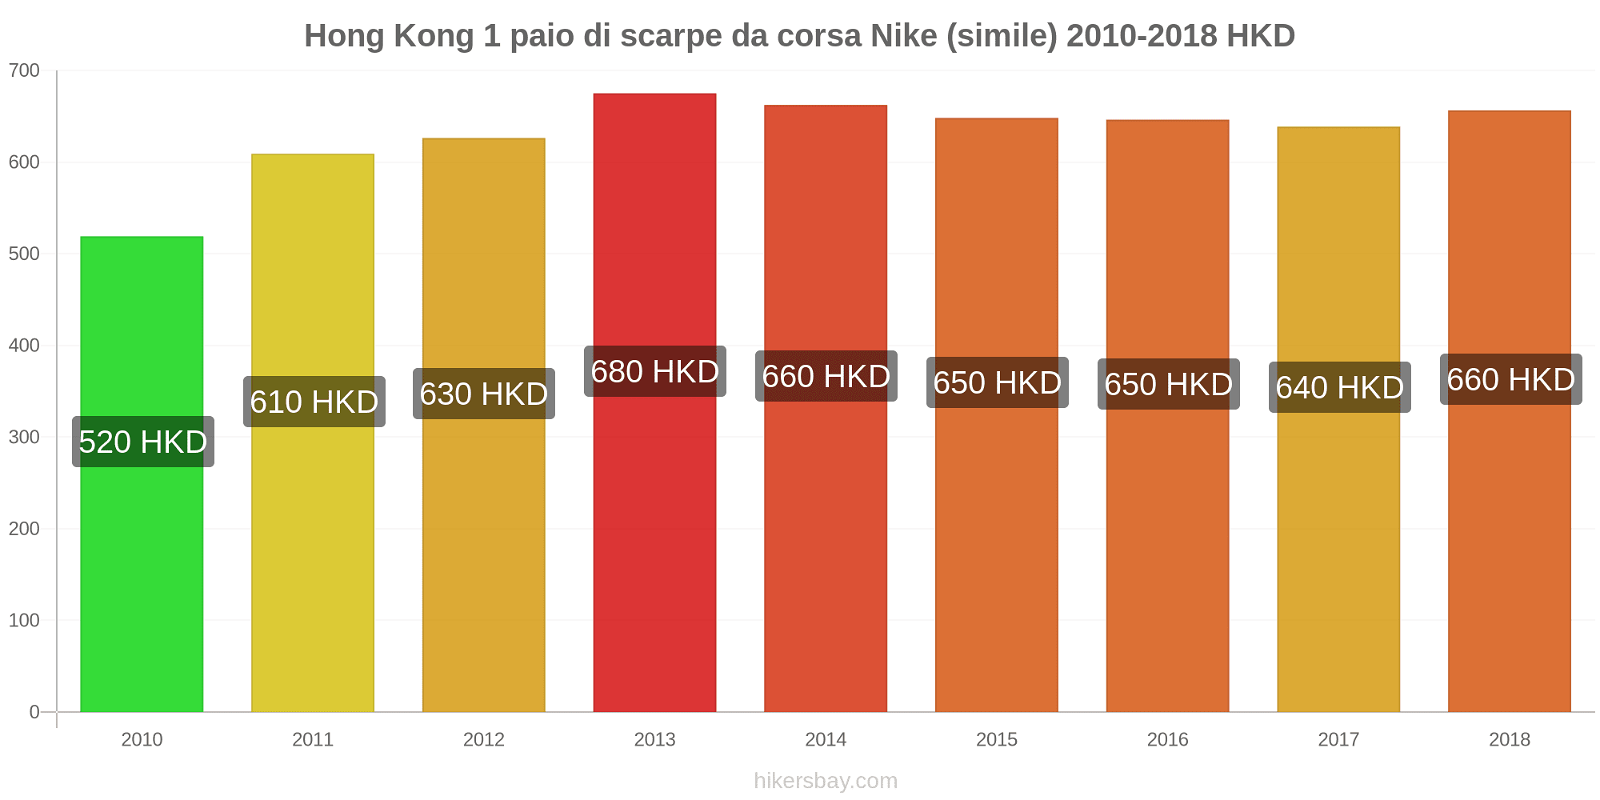 Hong Kong variazioni di prezzo 1 paio di scarpe da corsa Nike (simile) hikersbay.com